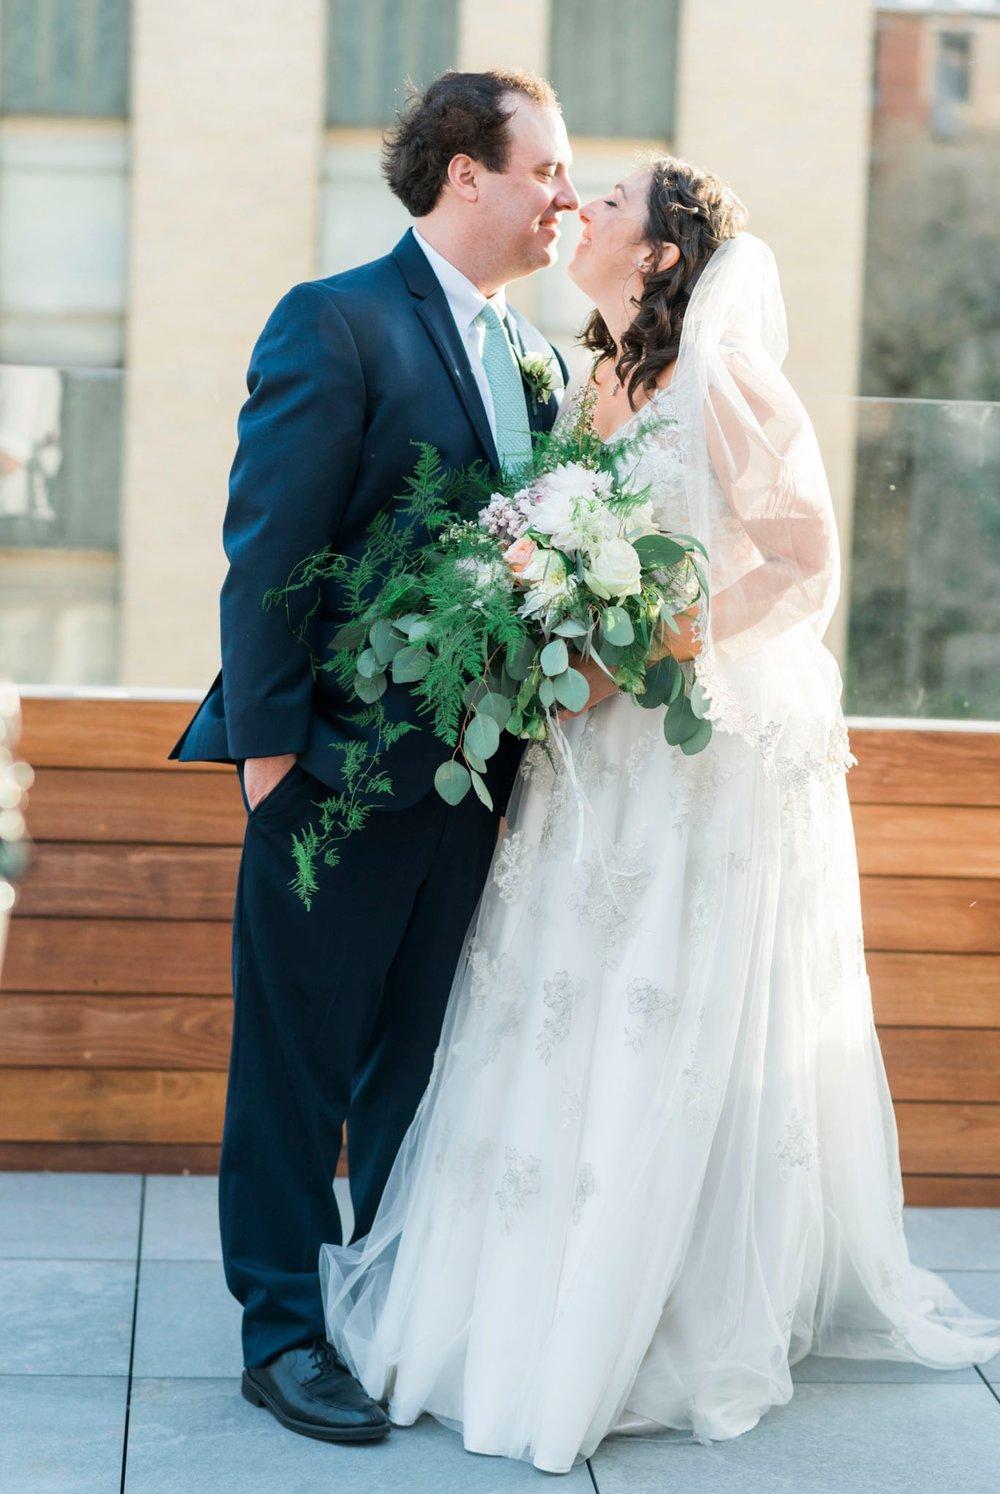 TheVirginianHotel_LynchburgVA_TheVirginianHotelWedding_Virginiaweddingphotographer_Lynchburgvawedding 45.jpg